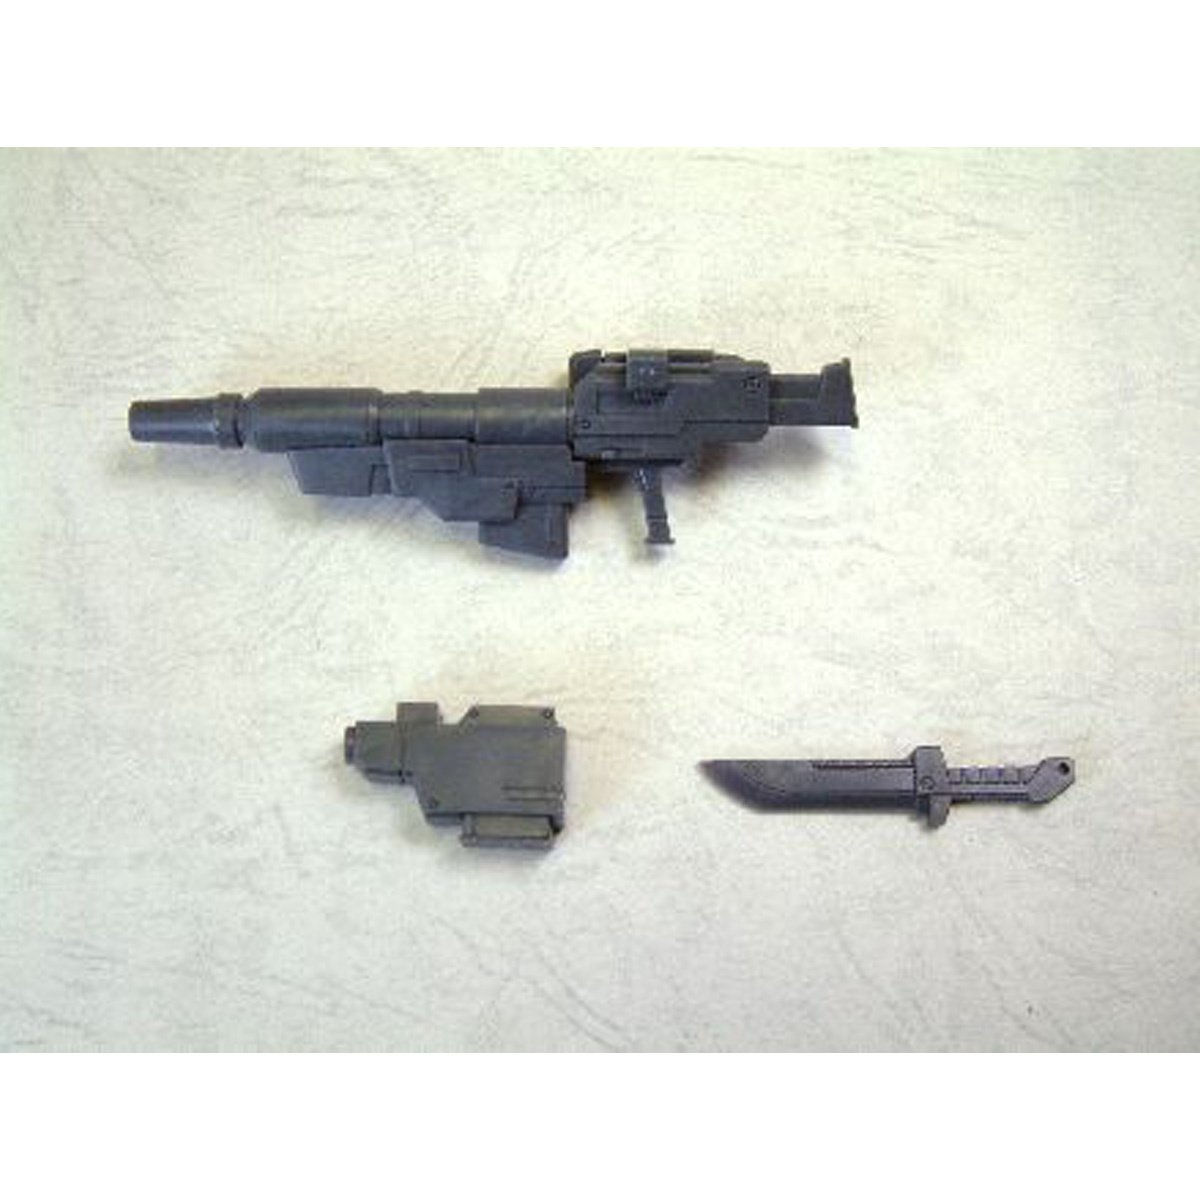 M S G  MW03R Grenade Launcher & Dagger Weapon Unit